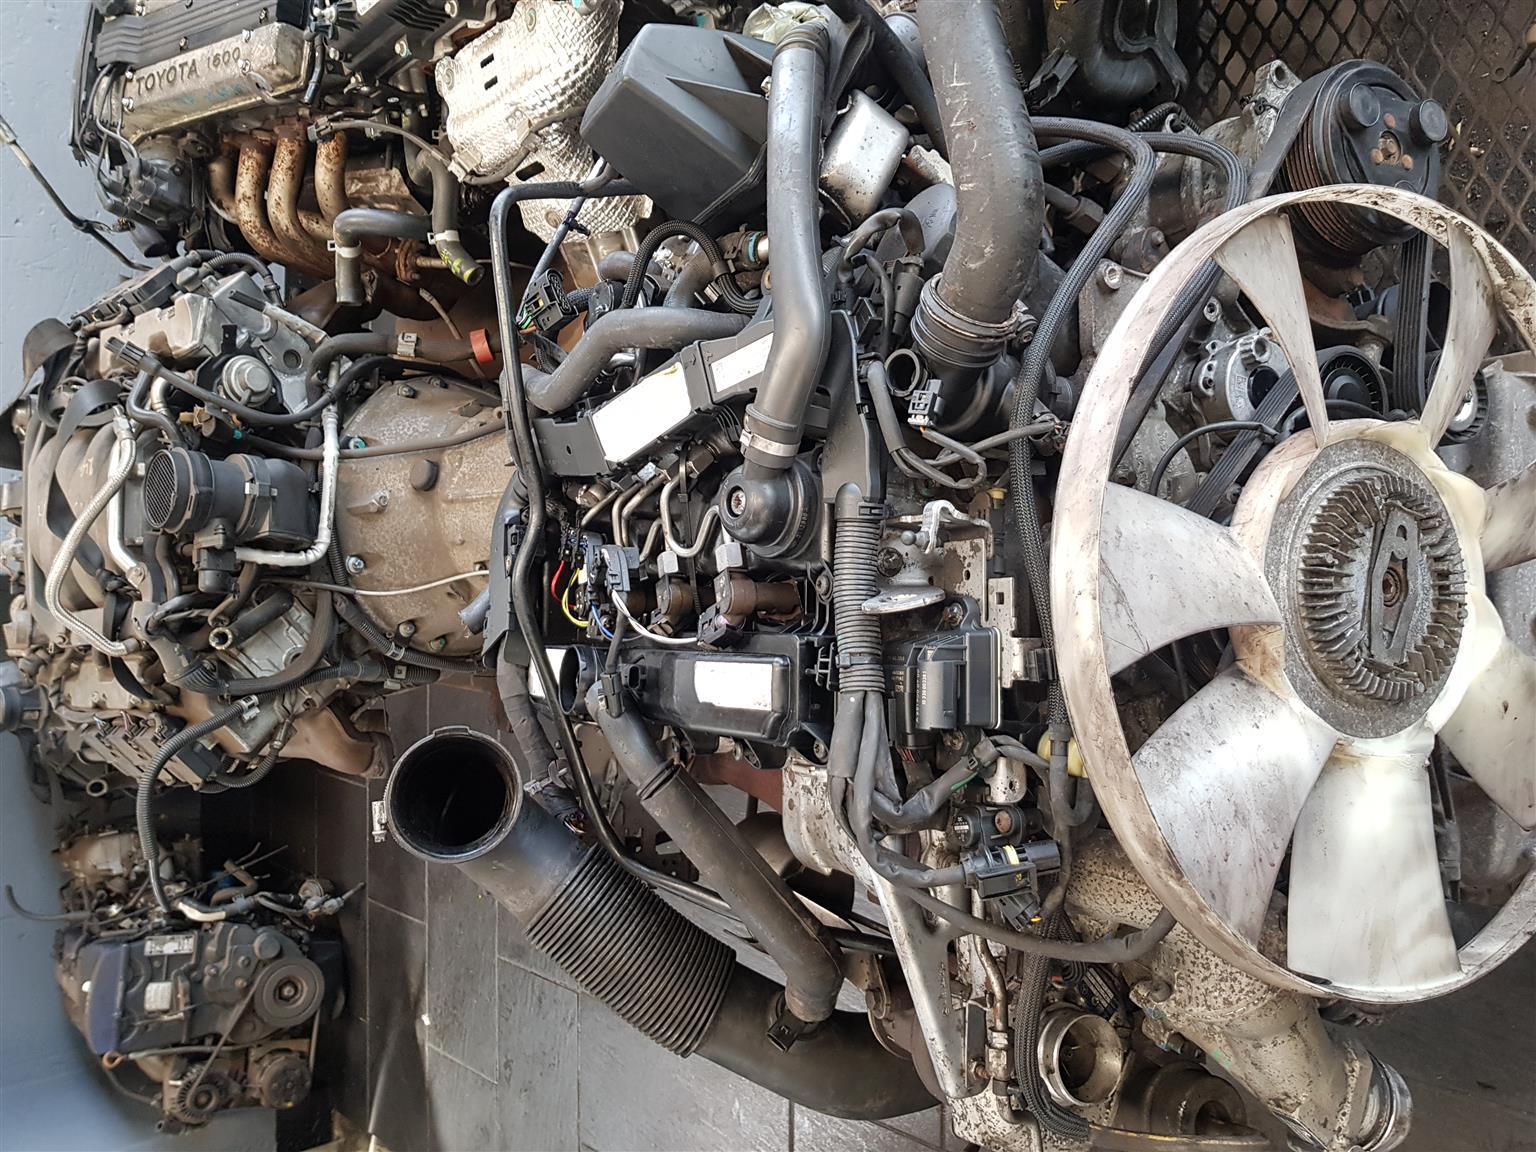 MERCEDES BENZ 651 VITO ENGINE FOR SALE